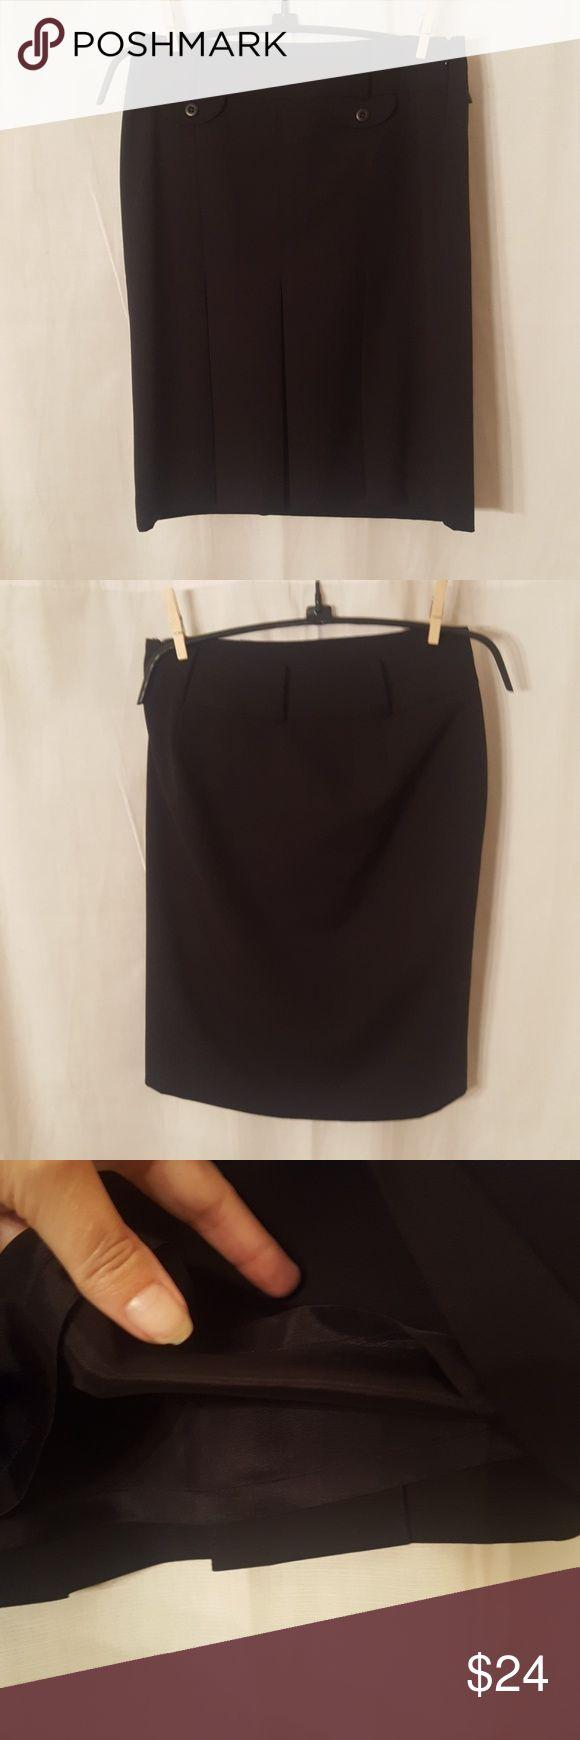 Anne Taylor LOFT Pencil Skirt Ann Taylor LOFT Pencil skirt  Side zipper  20 1/2 inches long Inside lining Great condition LOFT Skirts Pencil